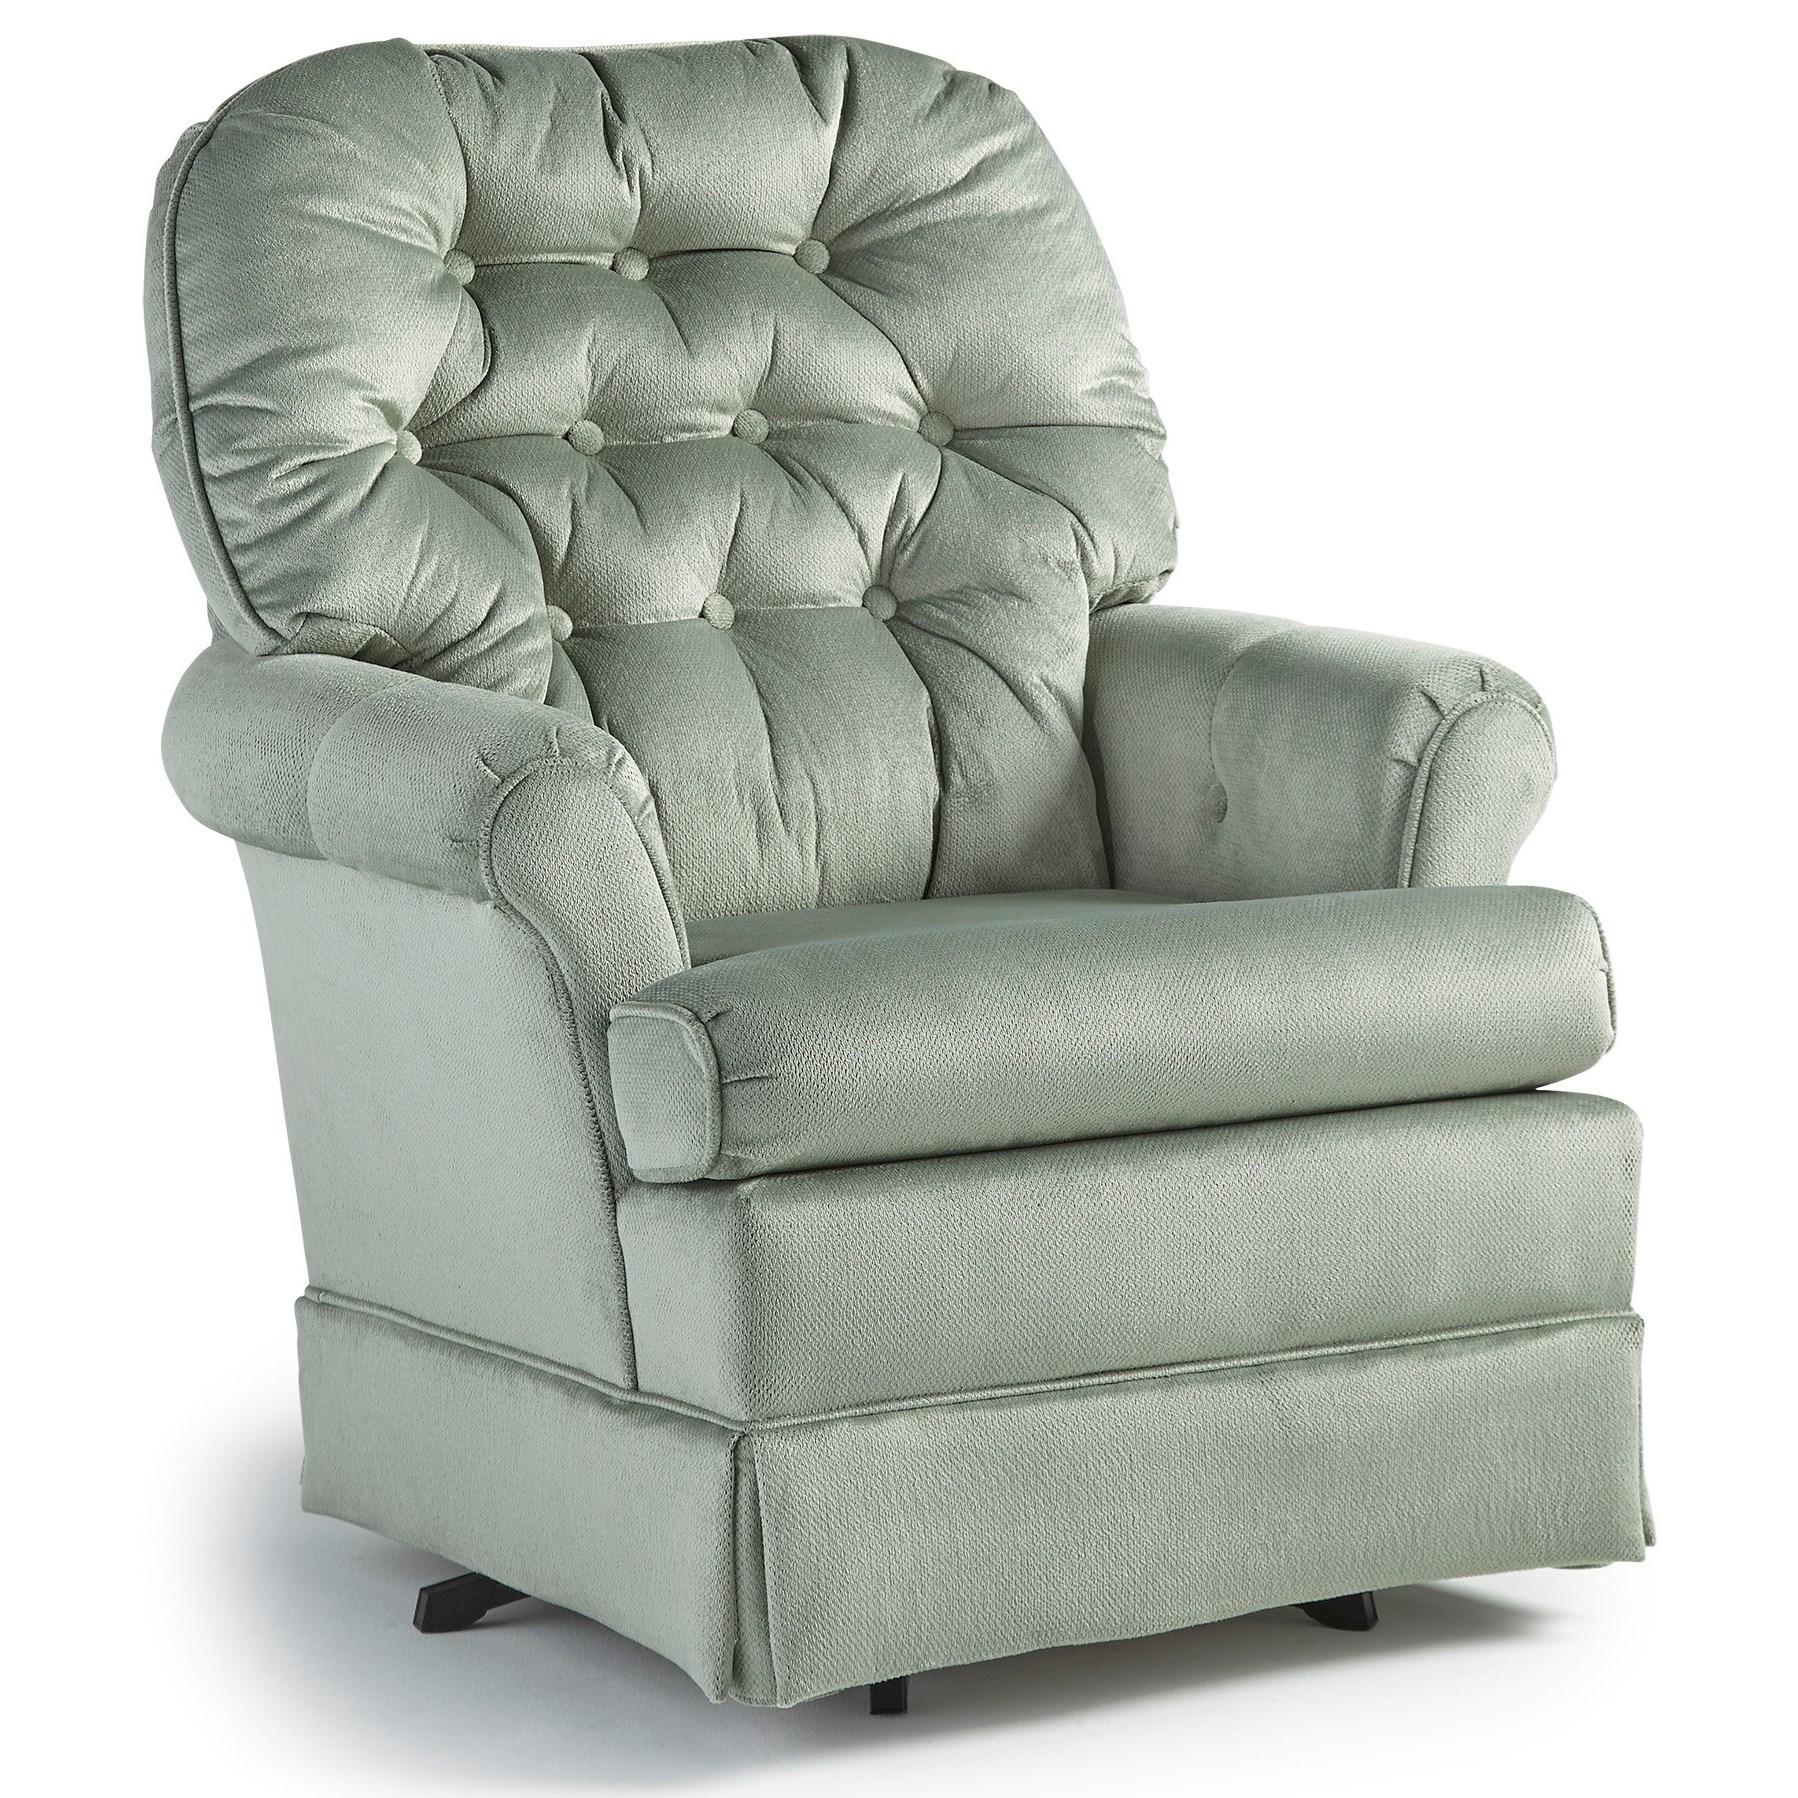 Best Home Furnishings Chairs - Swivel Glide Marla Swivel Glider Chair - Item Number: 1556